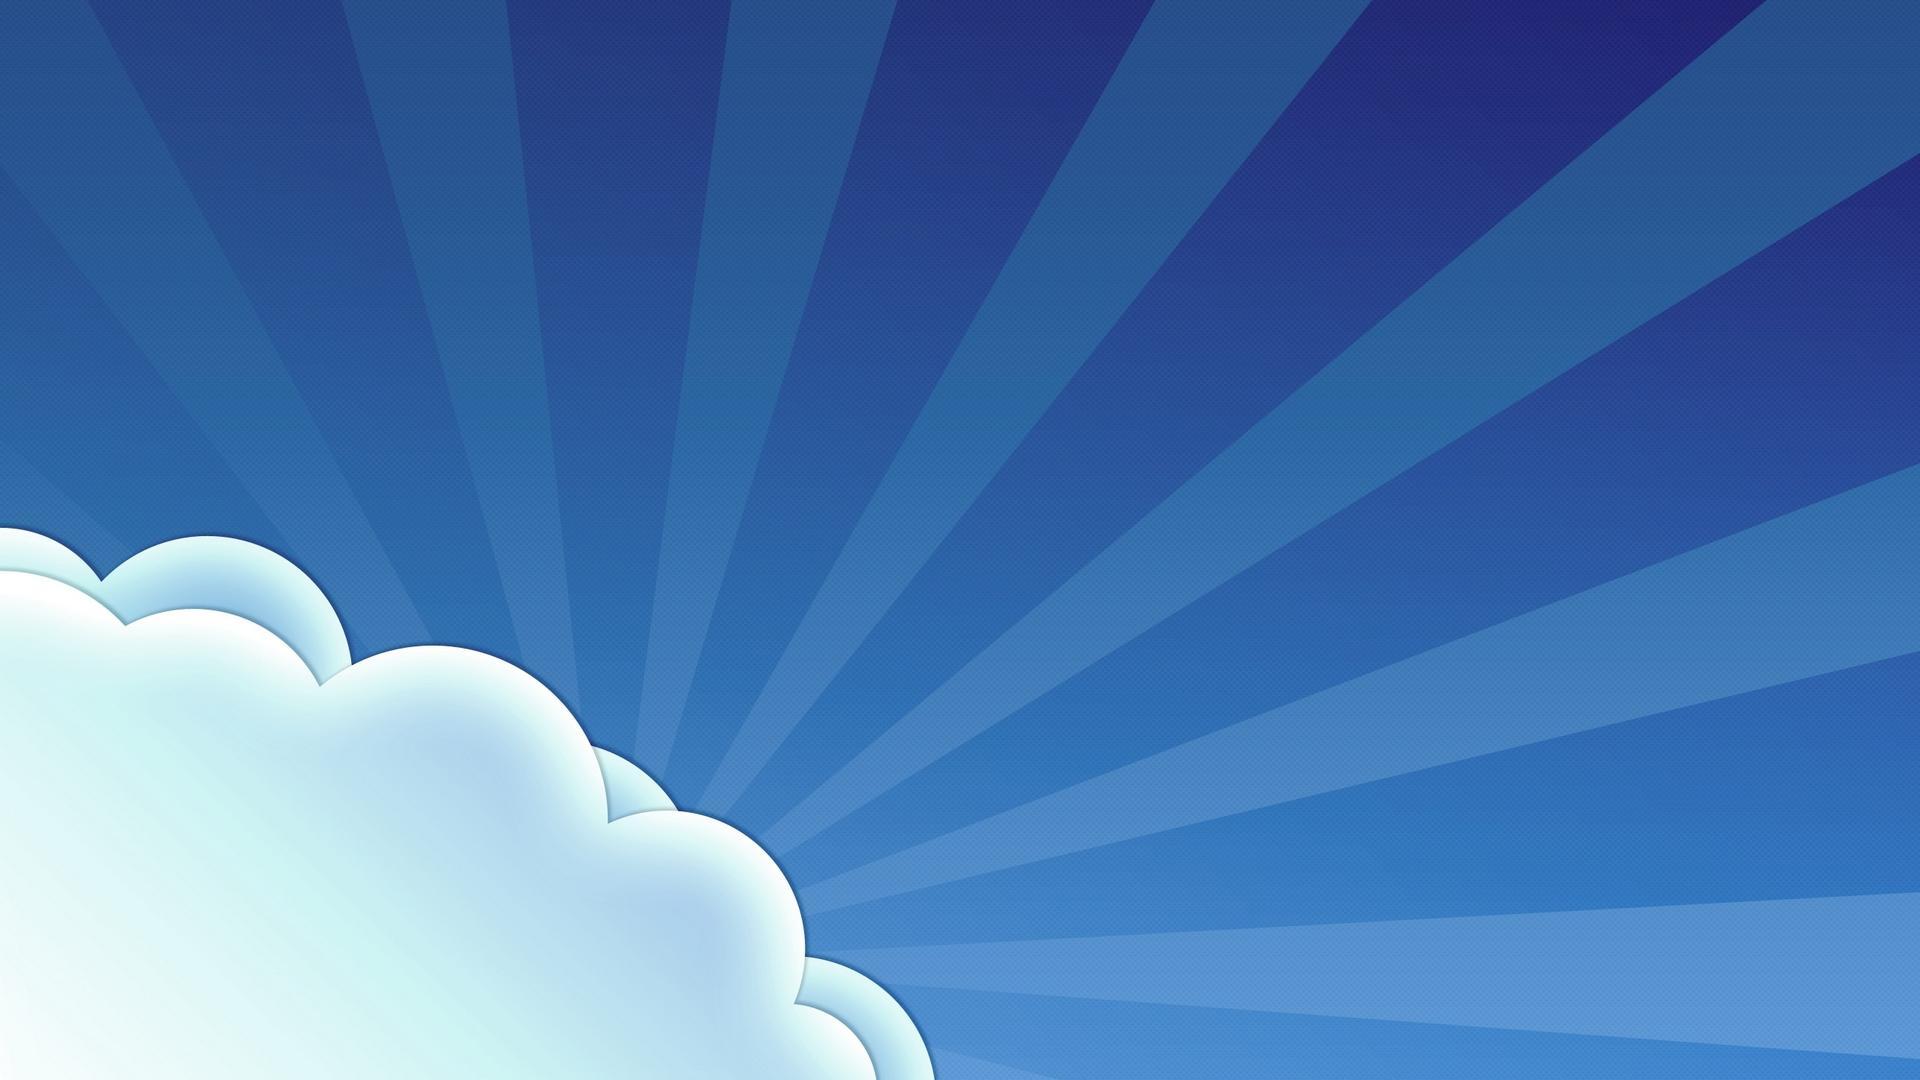 Облака вектор  № 3208078 без смс